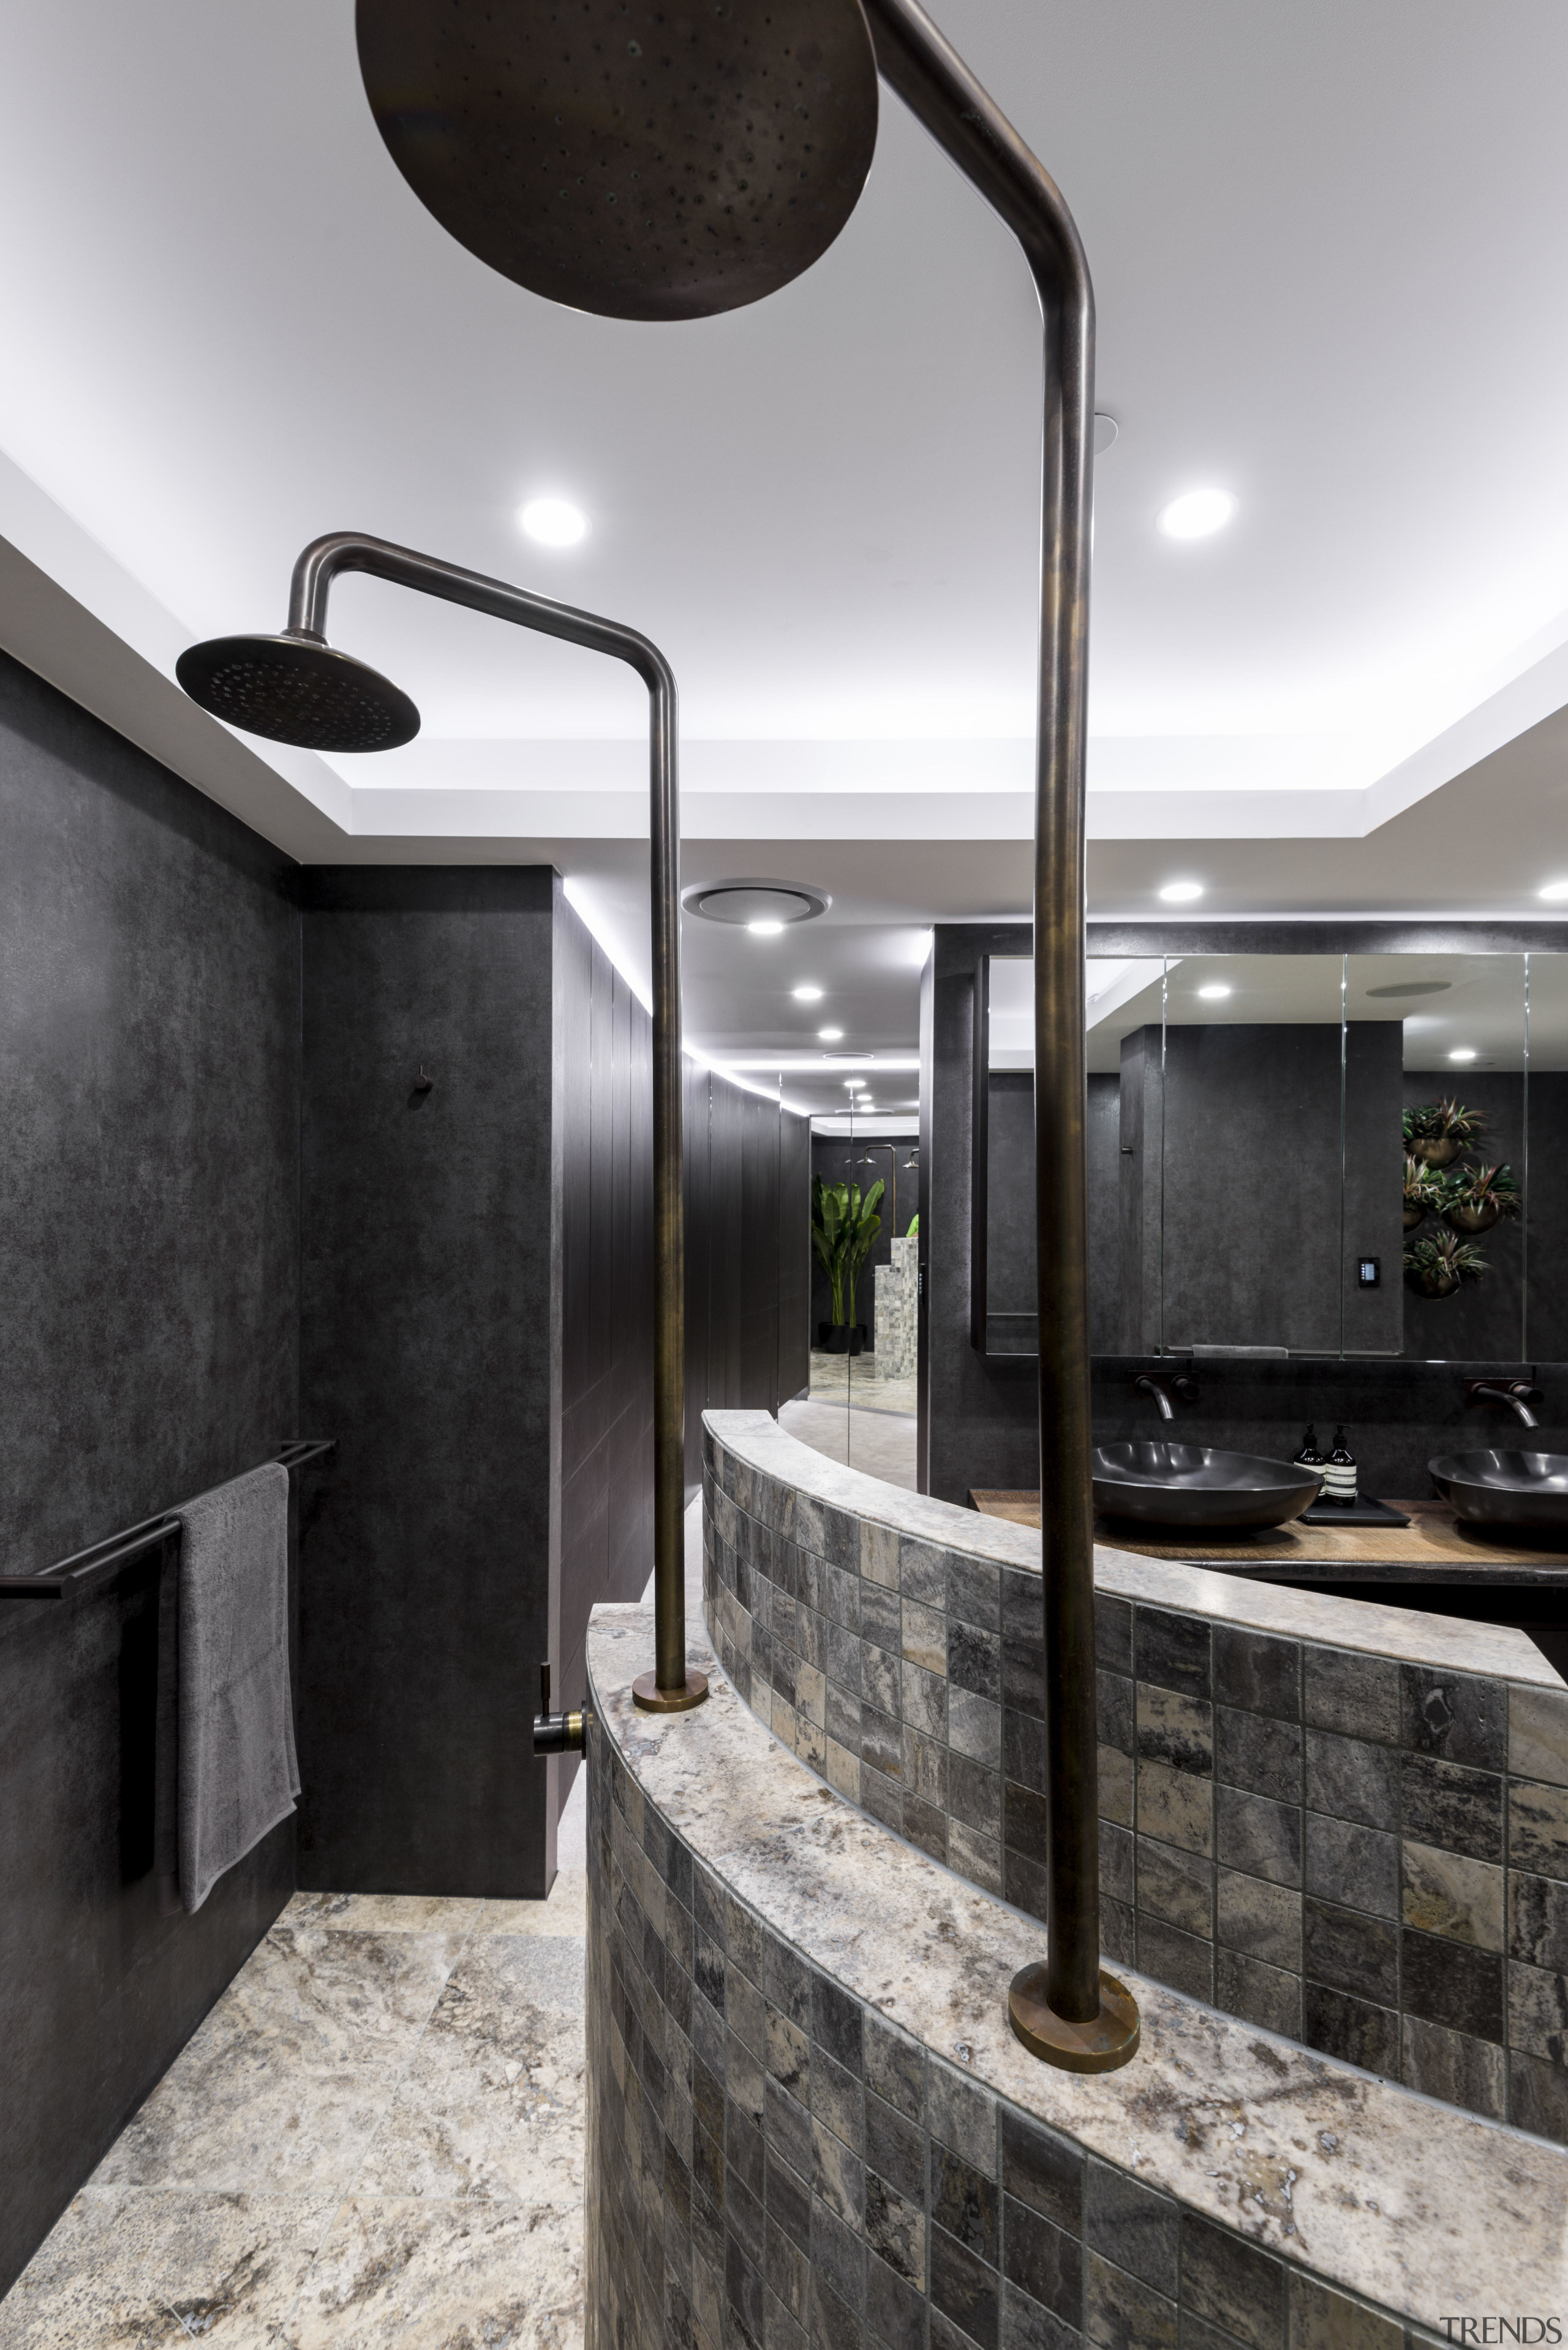 Designer Kim Duffin added a stepped curved shower architecture, interior design, black, gray, white